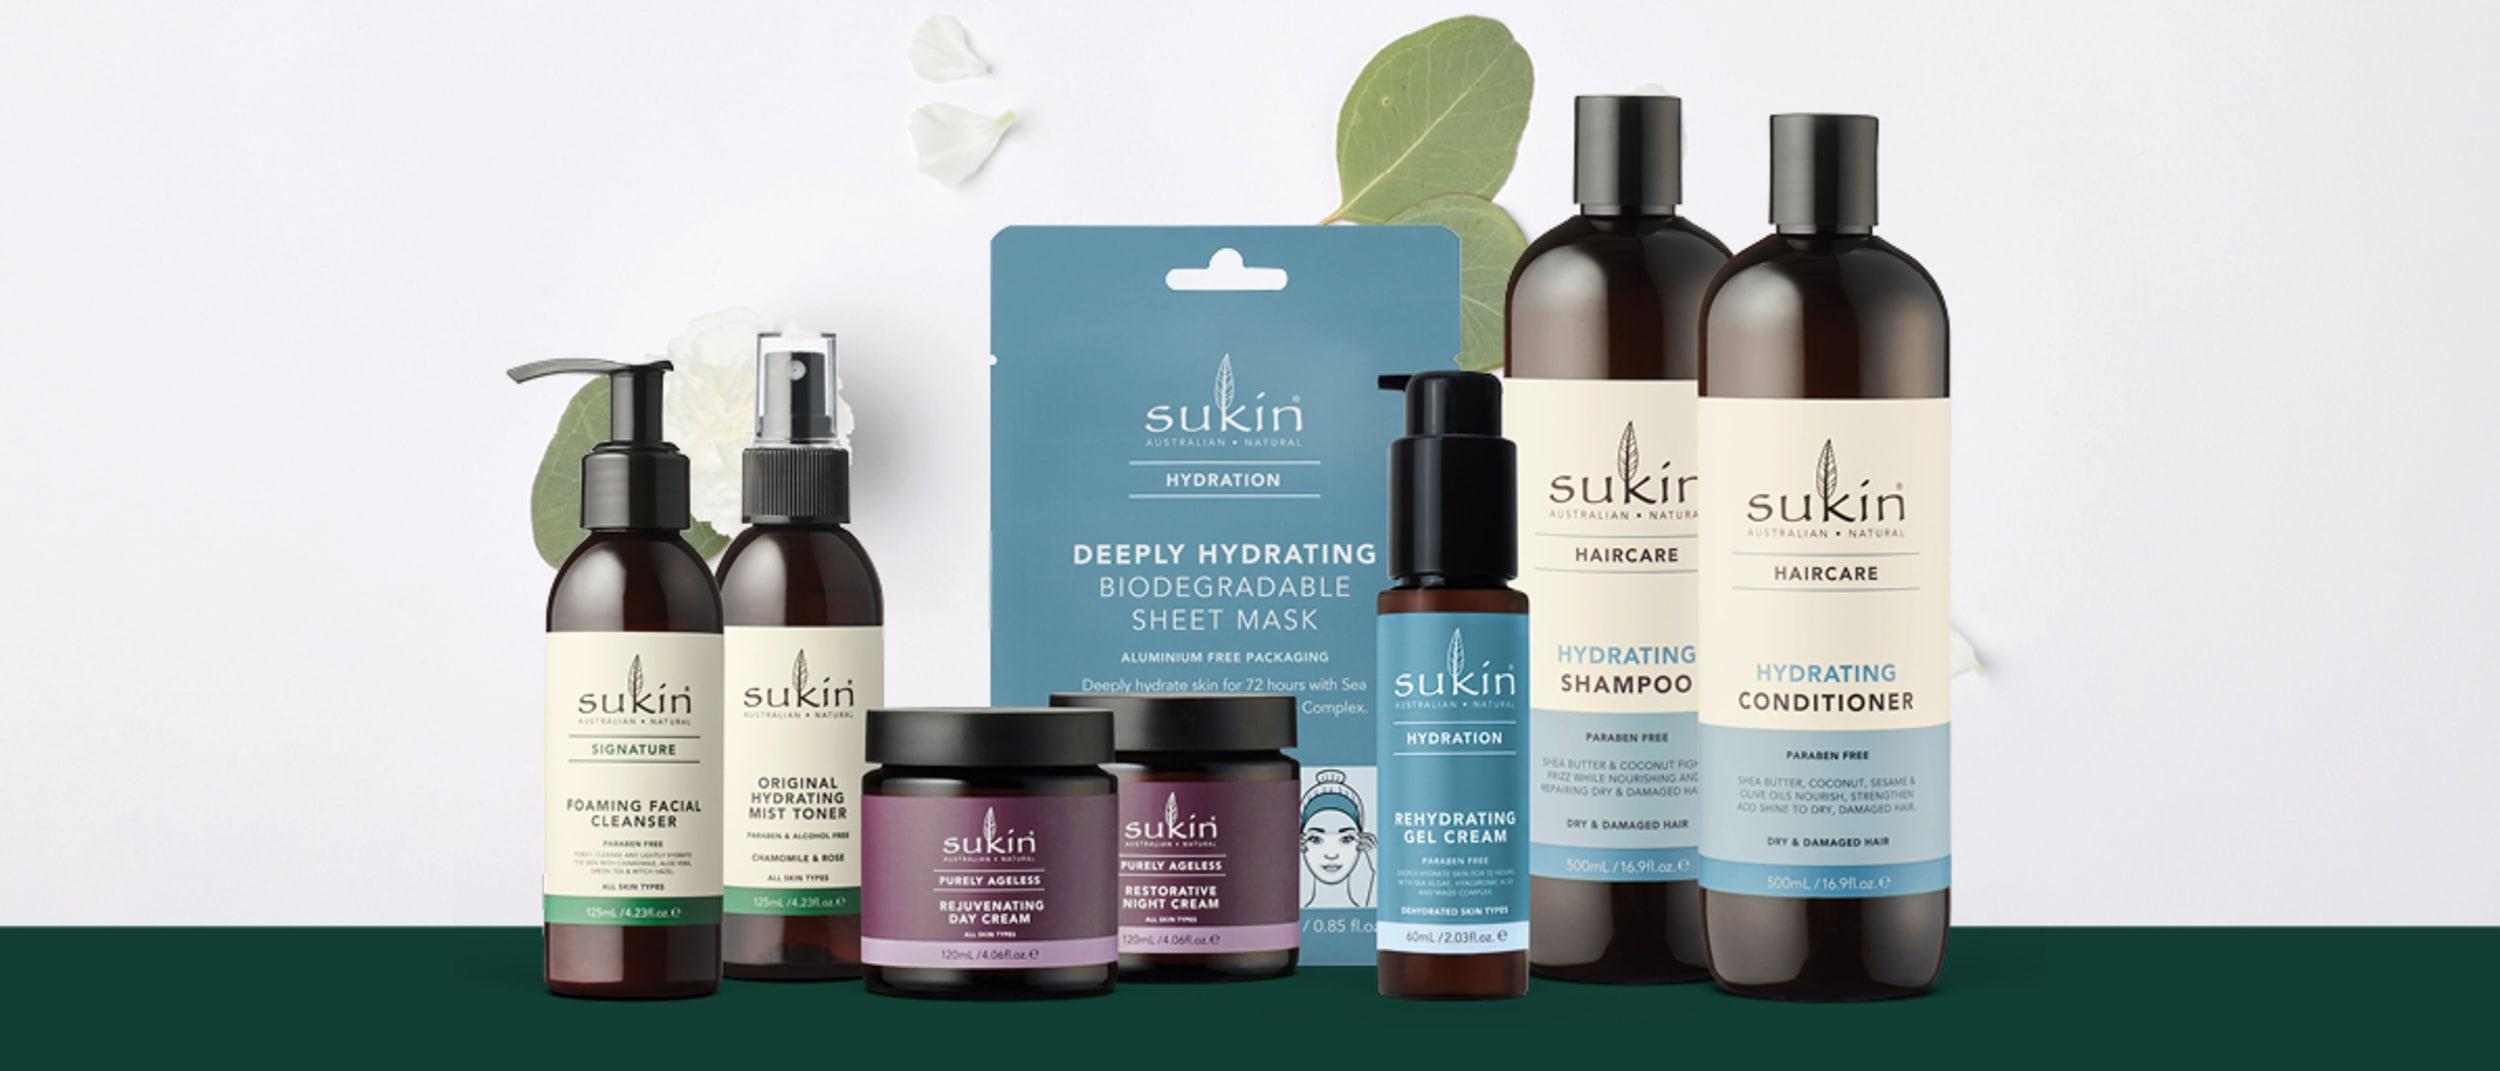 Priceline Pharmacy: Half price Sukin products